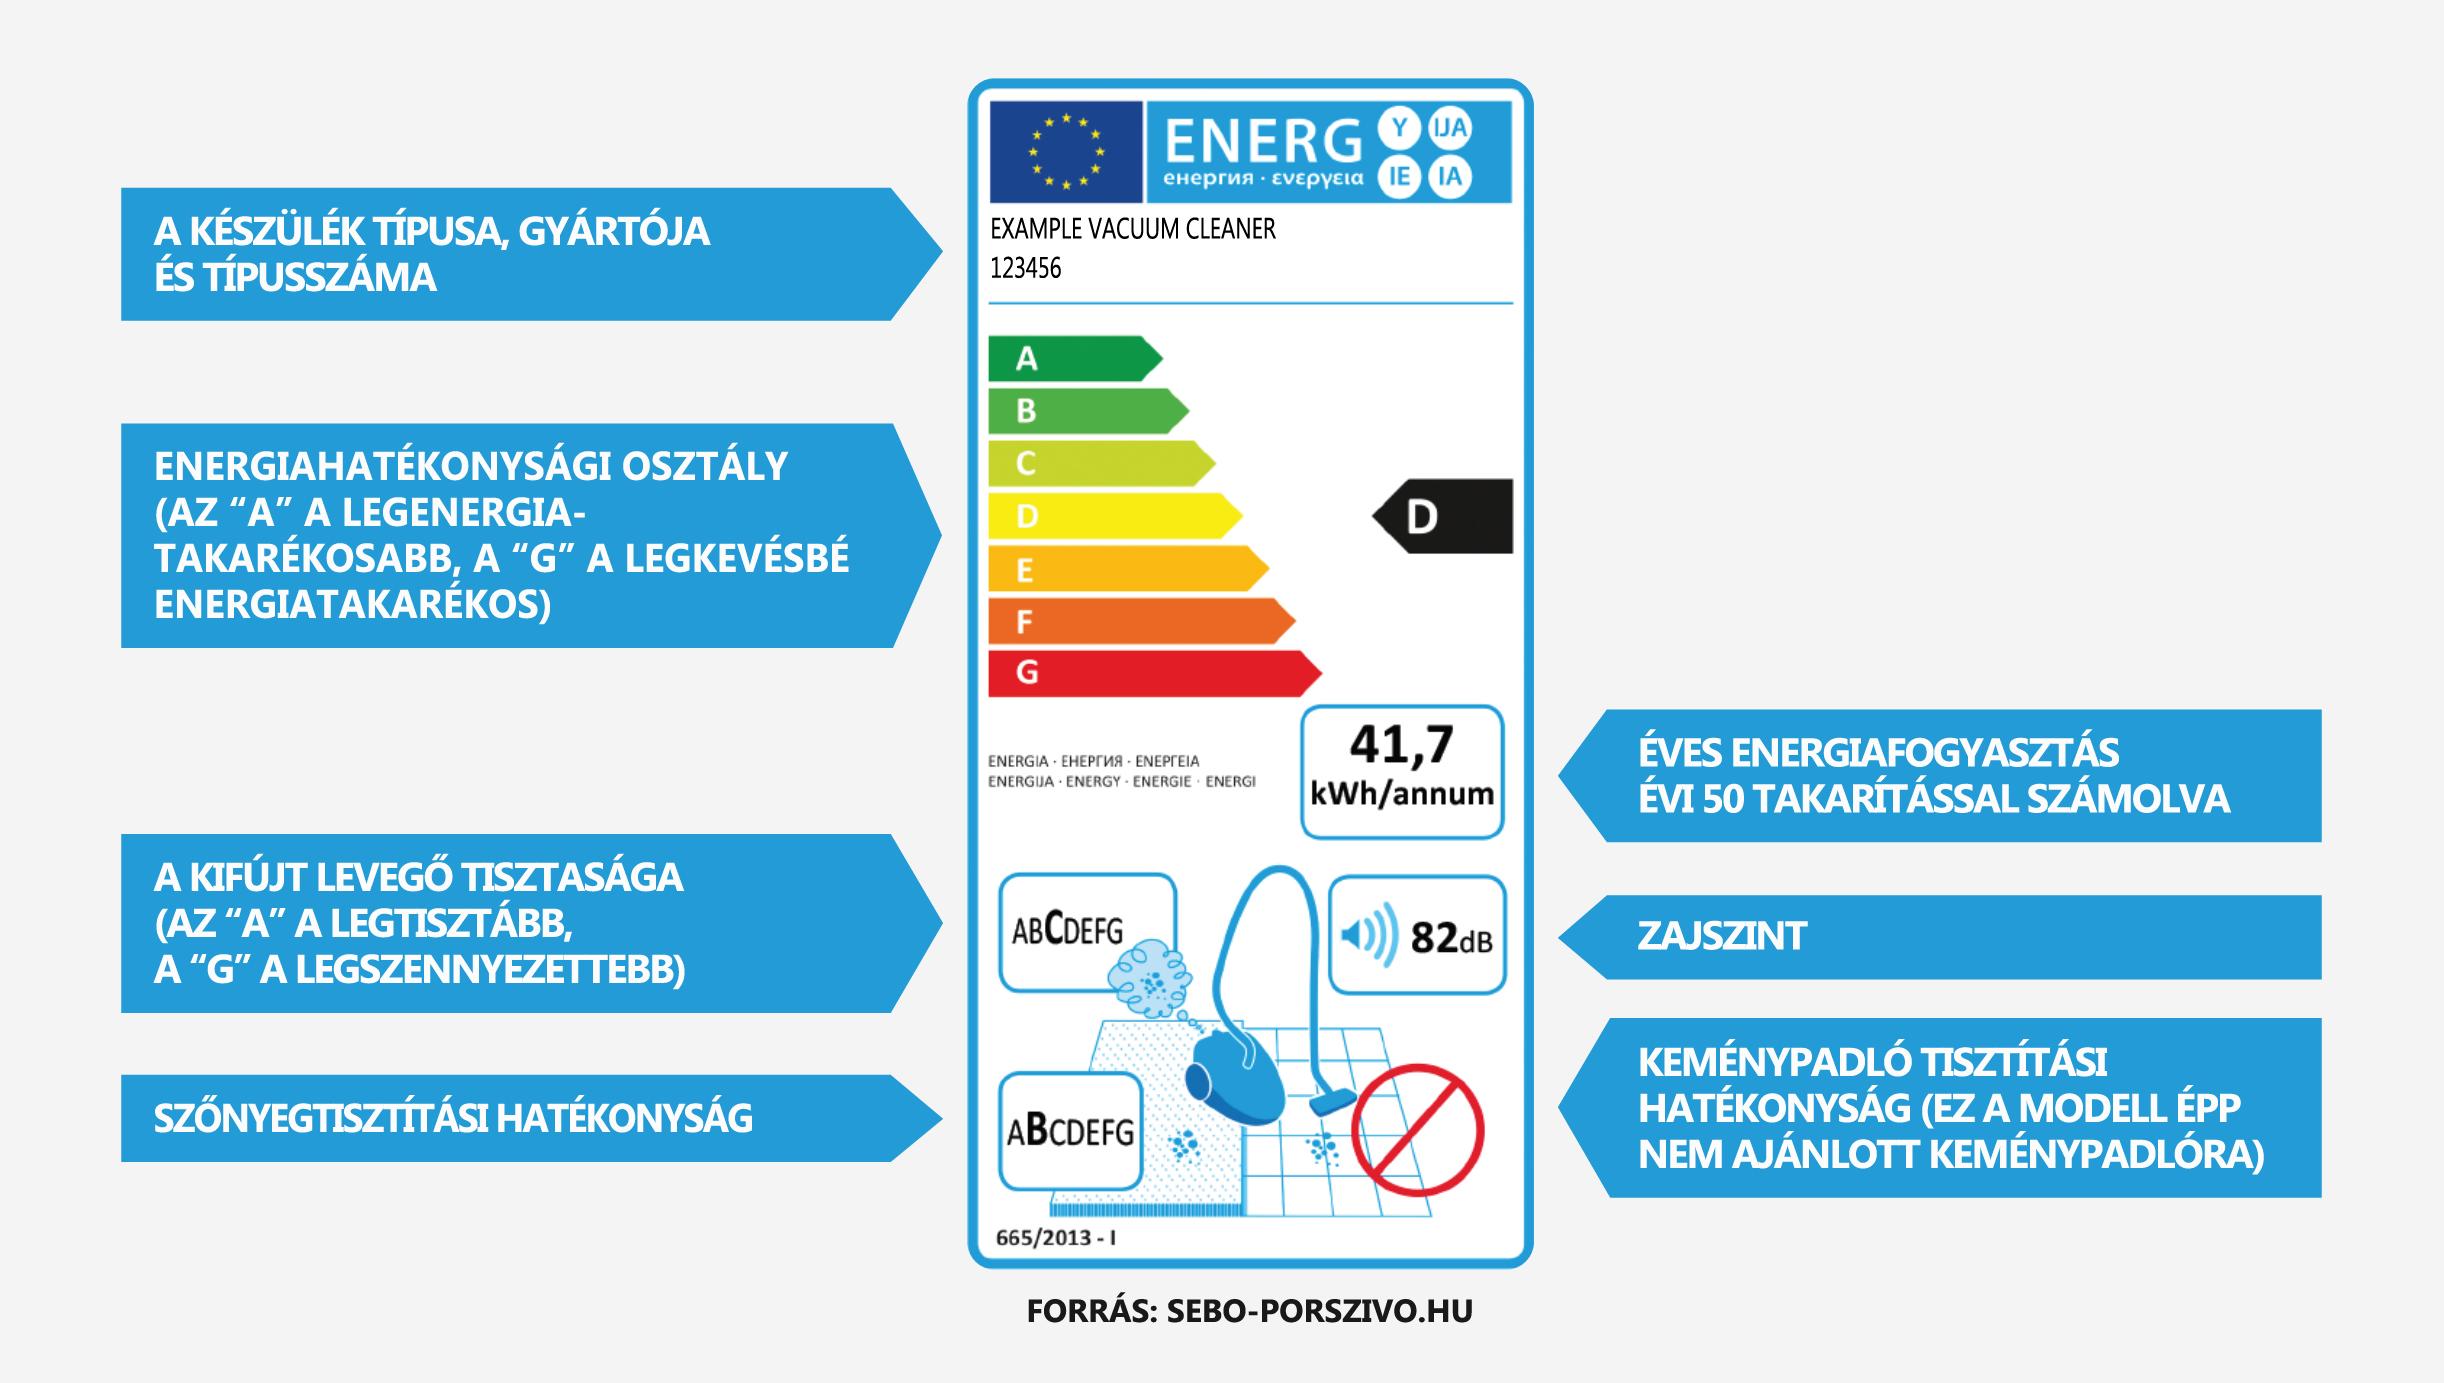 porszivo_energiacimke.png